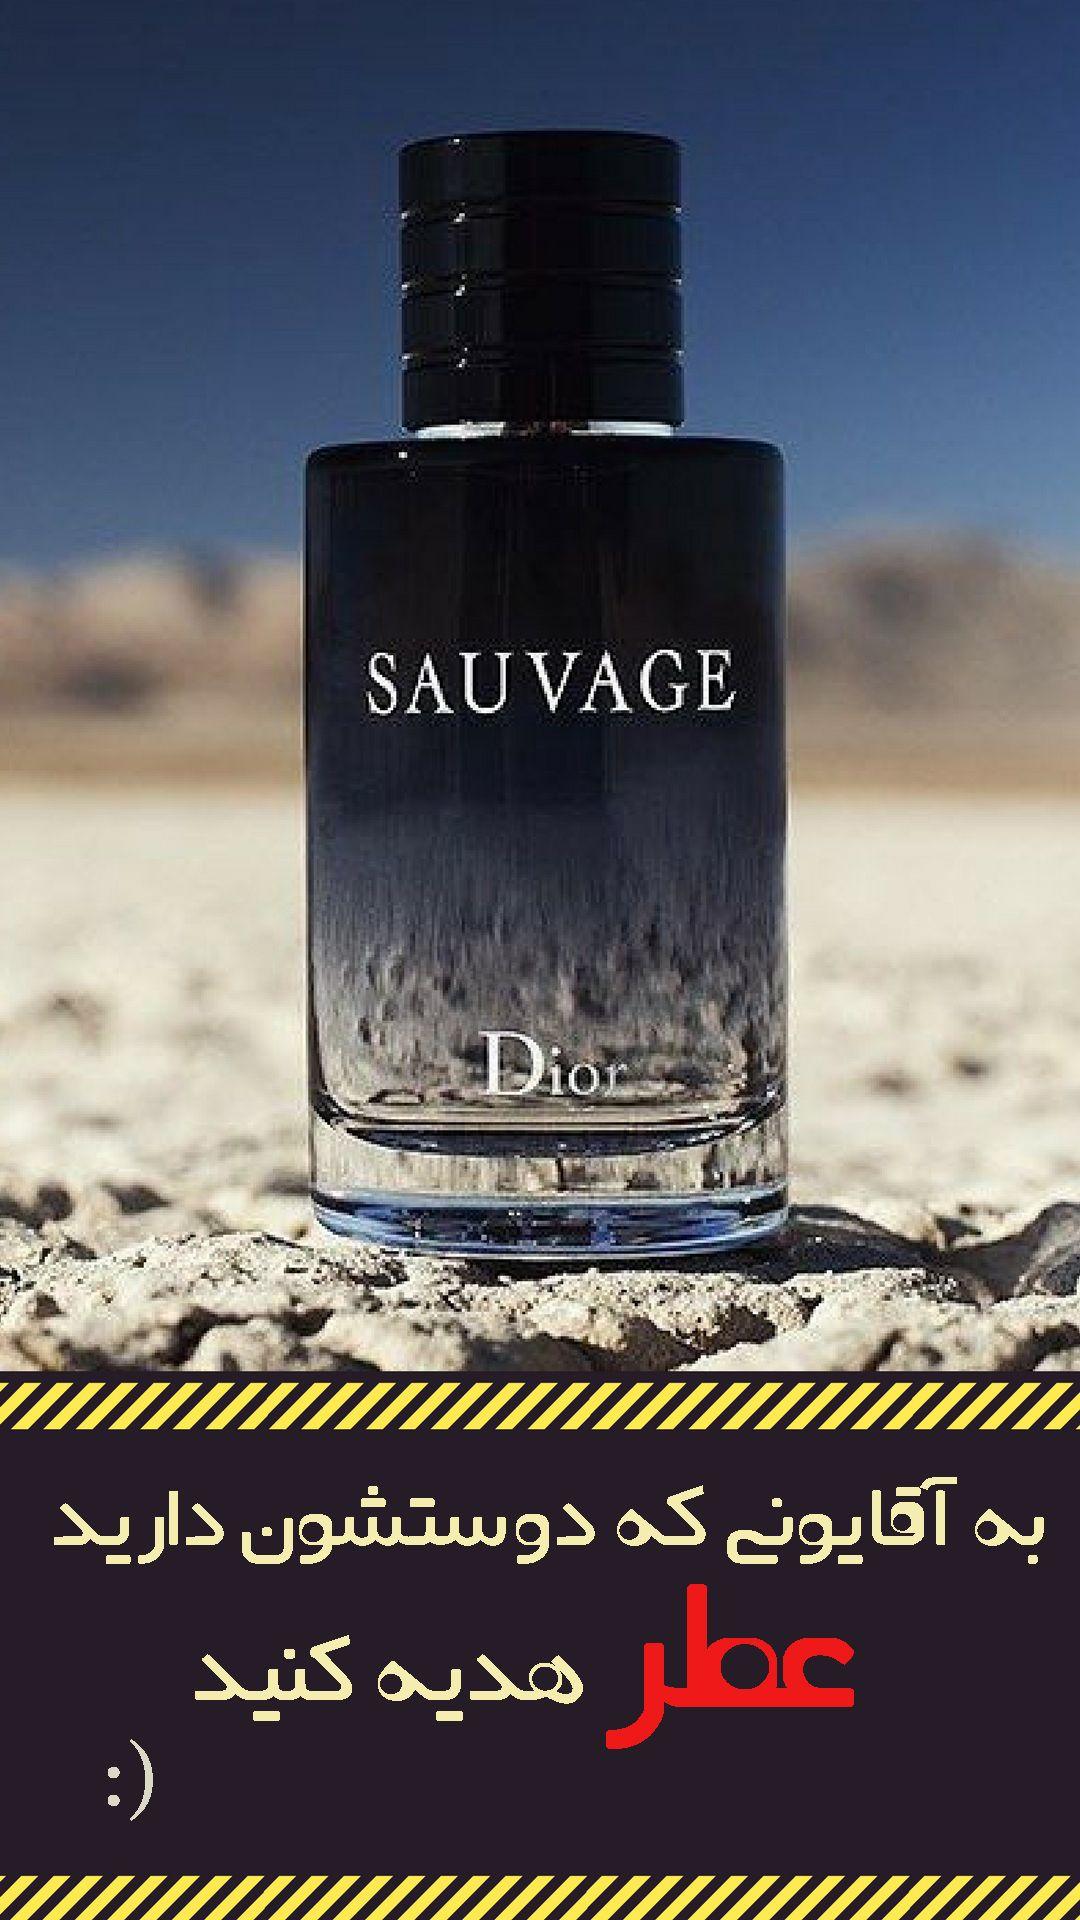 23f17b6f2 عطر مردانه #دیور عطر #دیور اصل ادکلن مردانه #دیور #dior #sauvage ...